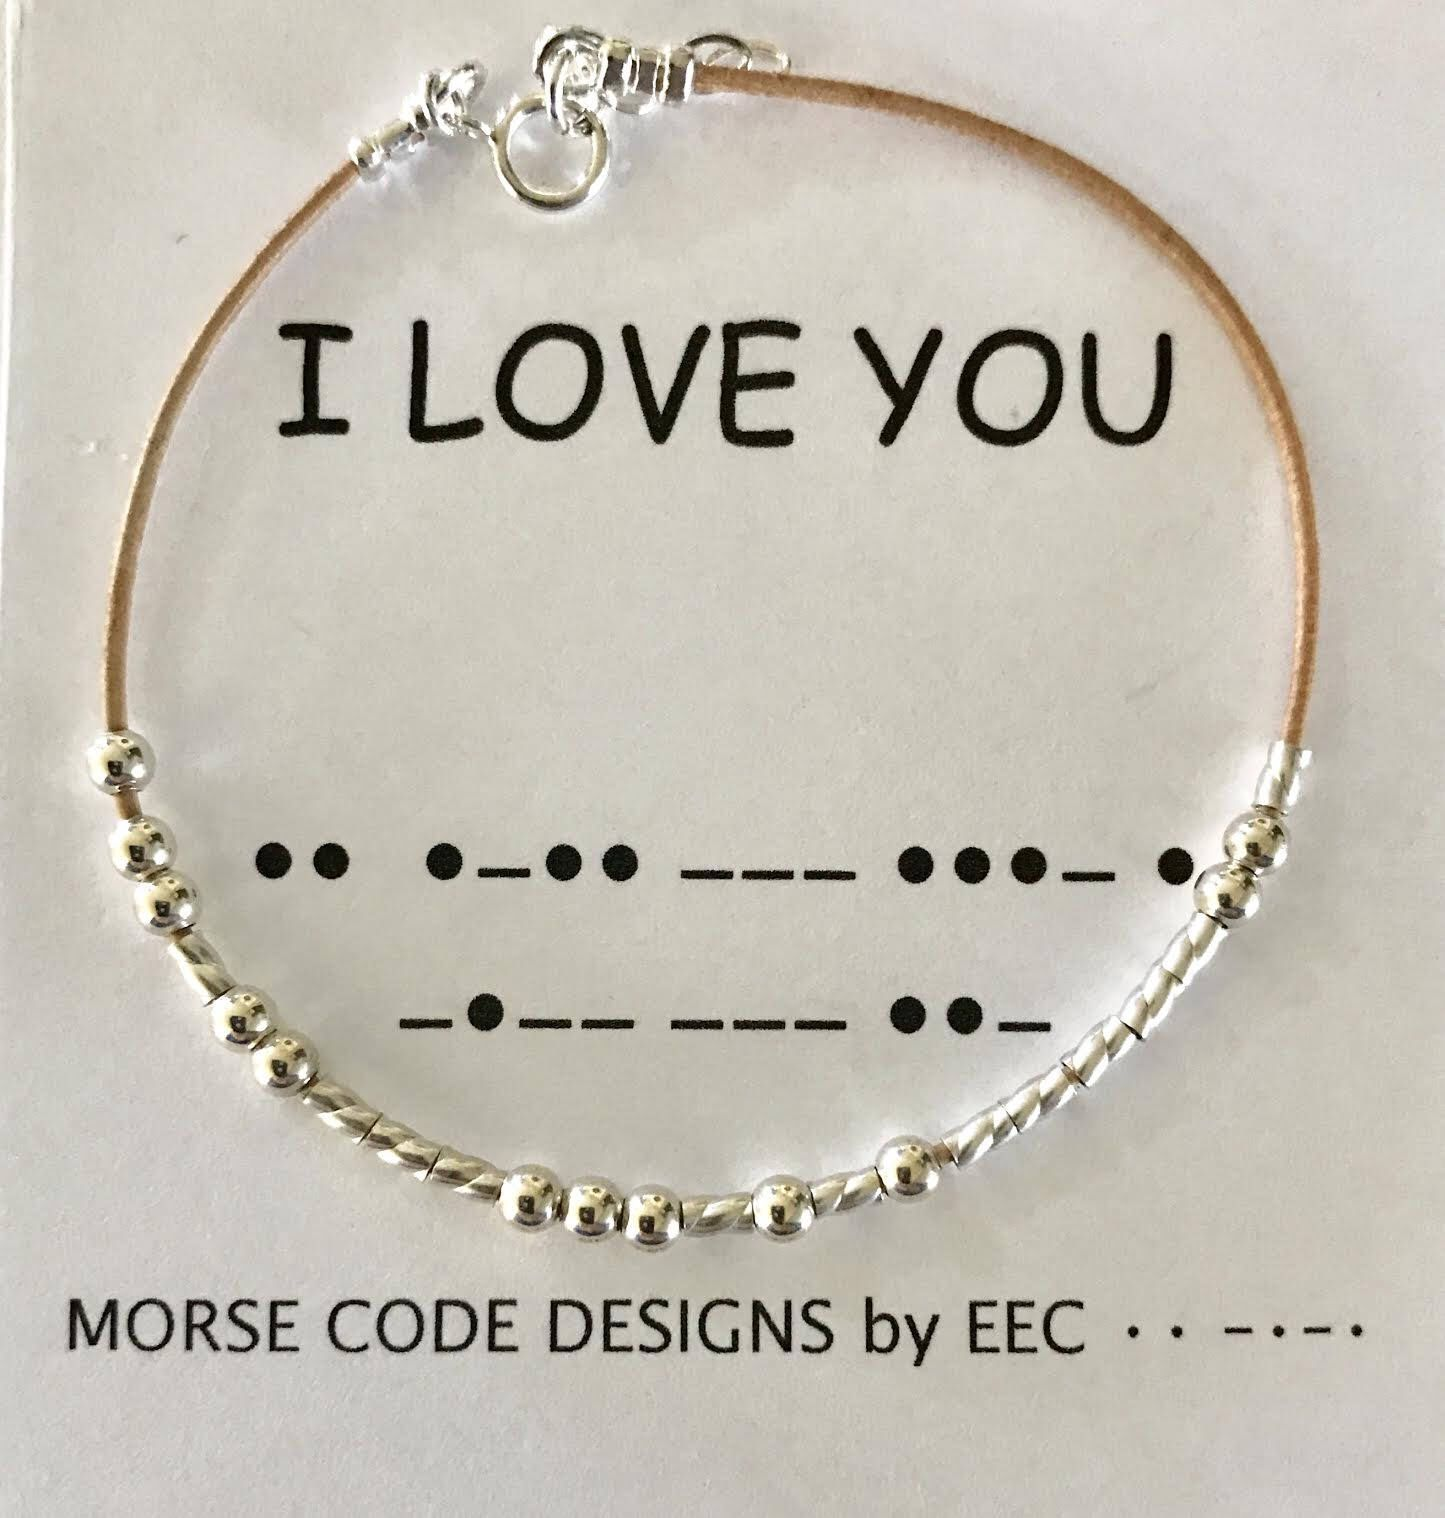 I Love You Morse Code Bracelet Leather Morse Code Bracelet Etsy Morse Code Bracelet Diy Jewelry For Beginners Jewelry Diy Bracelets